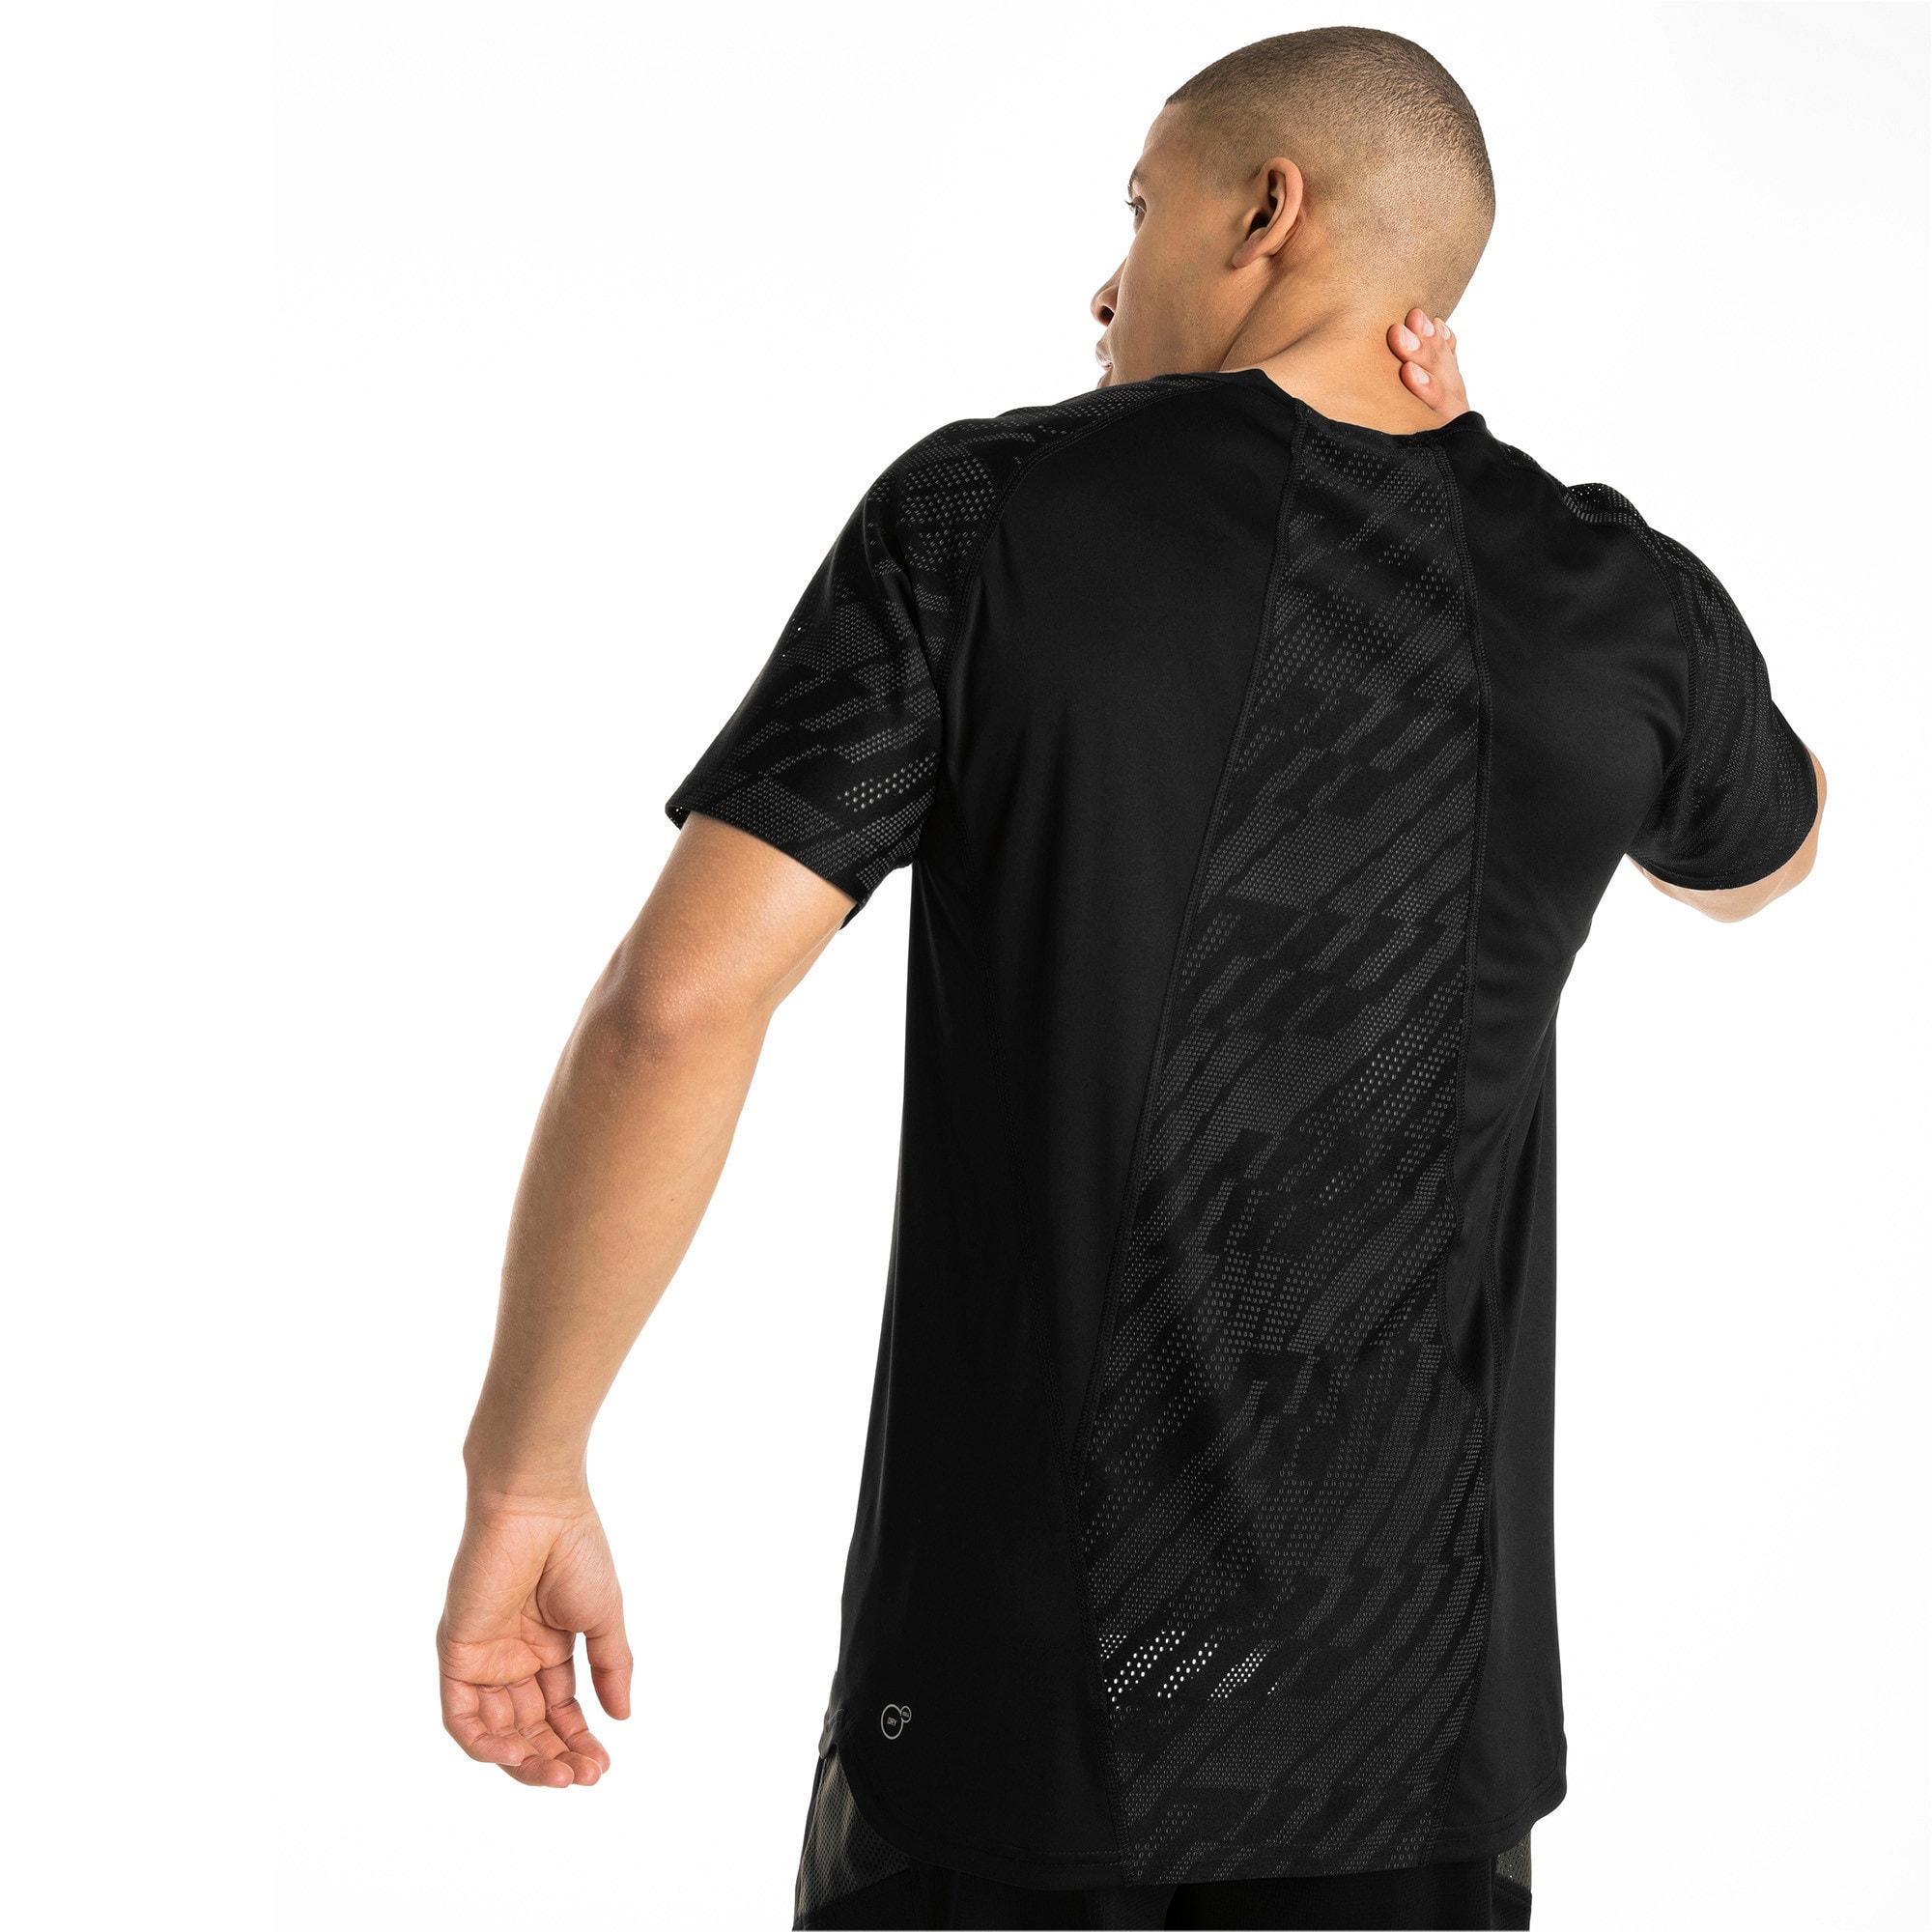 Thumbnail 2 of VENT Graphic Men's T-Shirt, Puma Black-iron gate, medium-IND